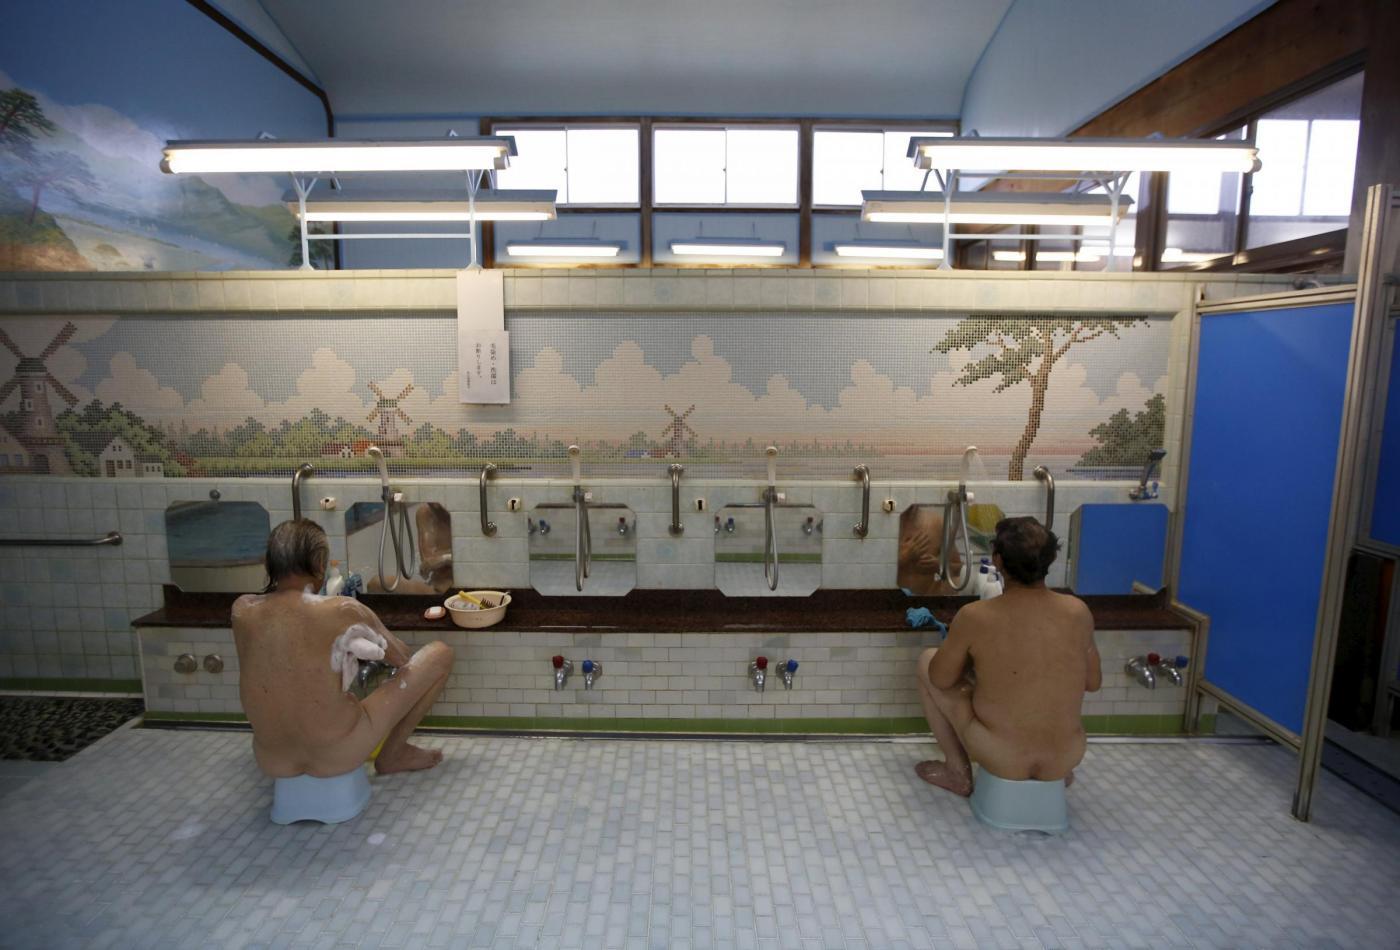 Bagno Giapponese. Latest Nei Bagni Giapponesi C Una Zona Apposita ...